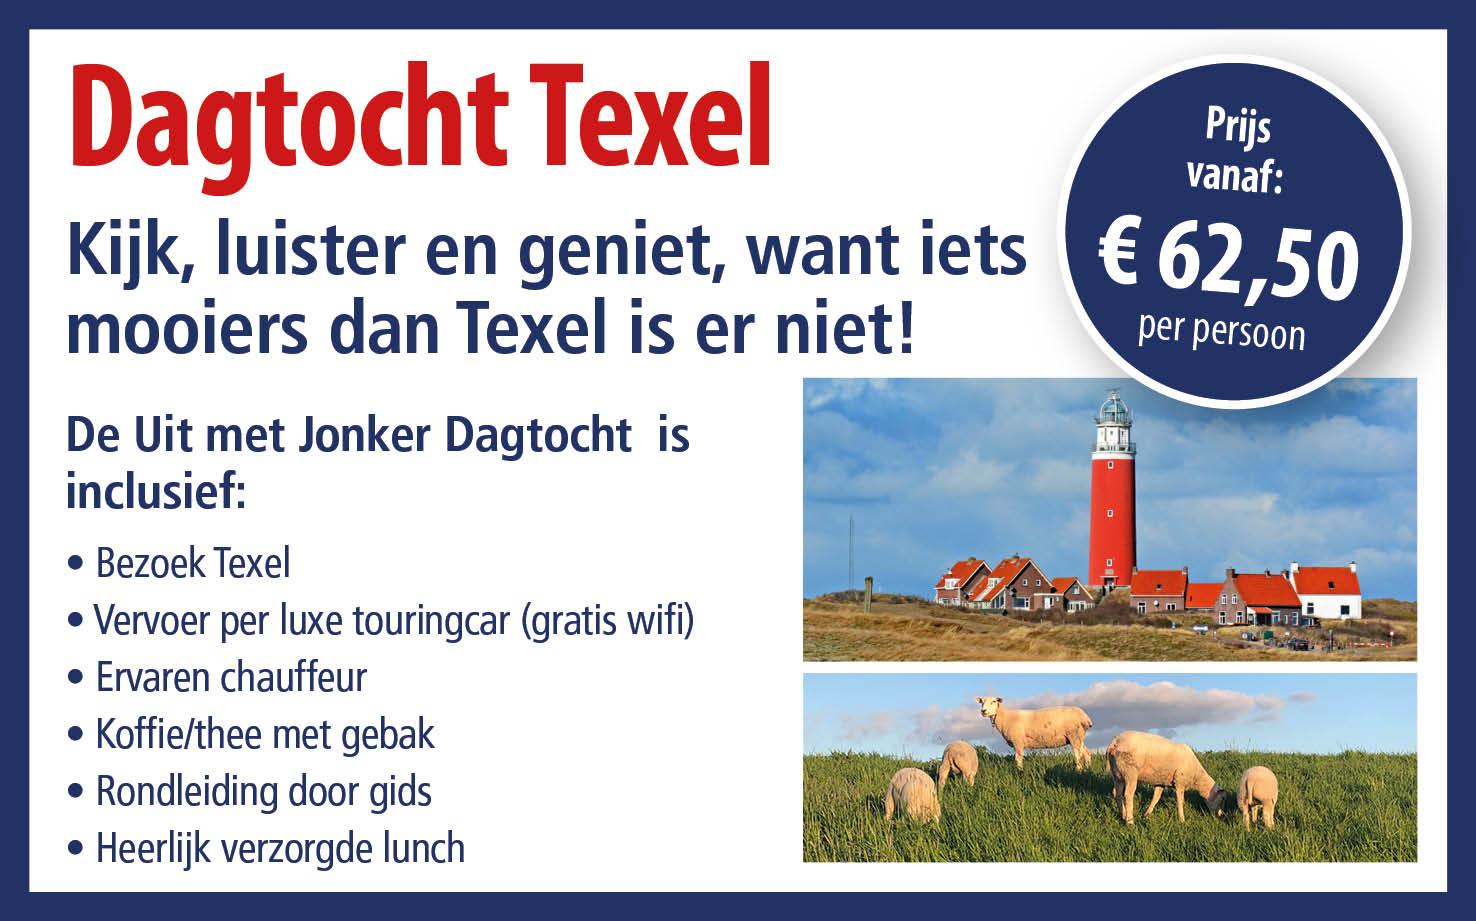 Dagtocht Texel